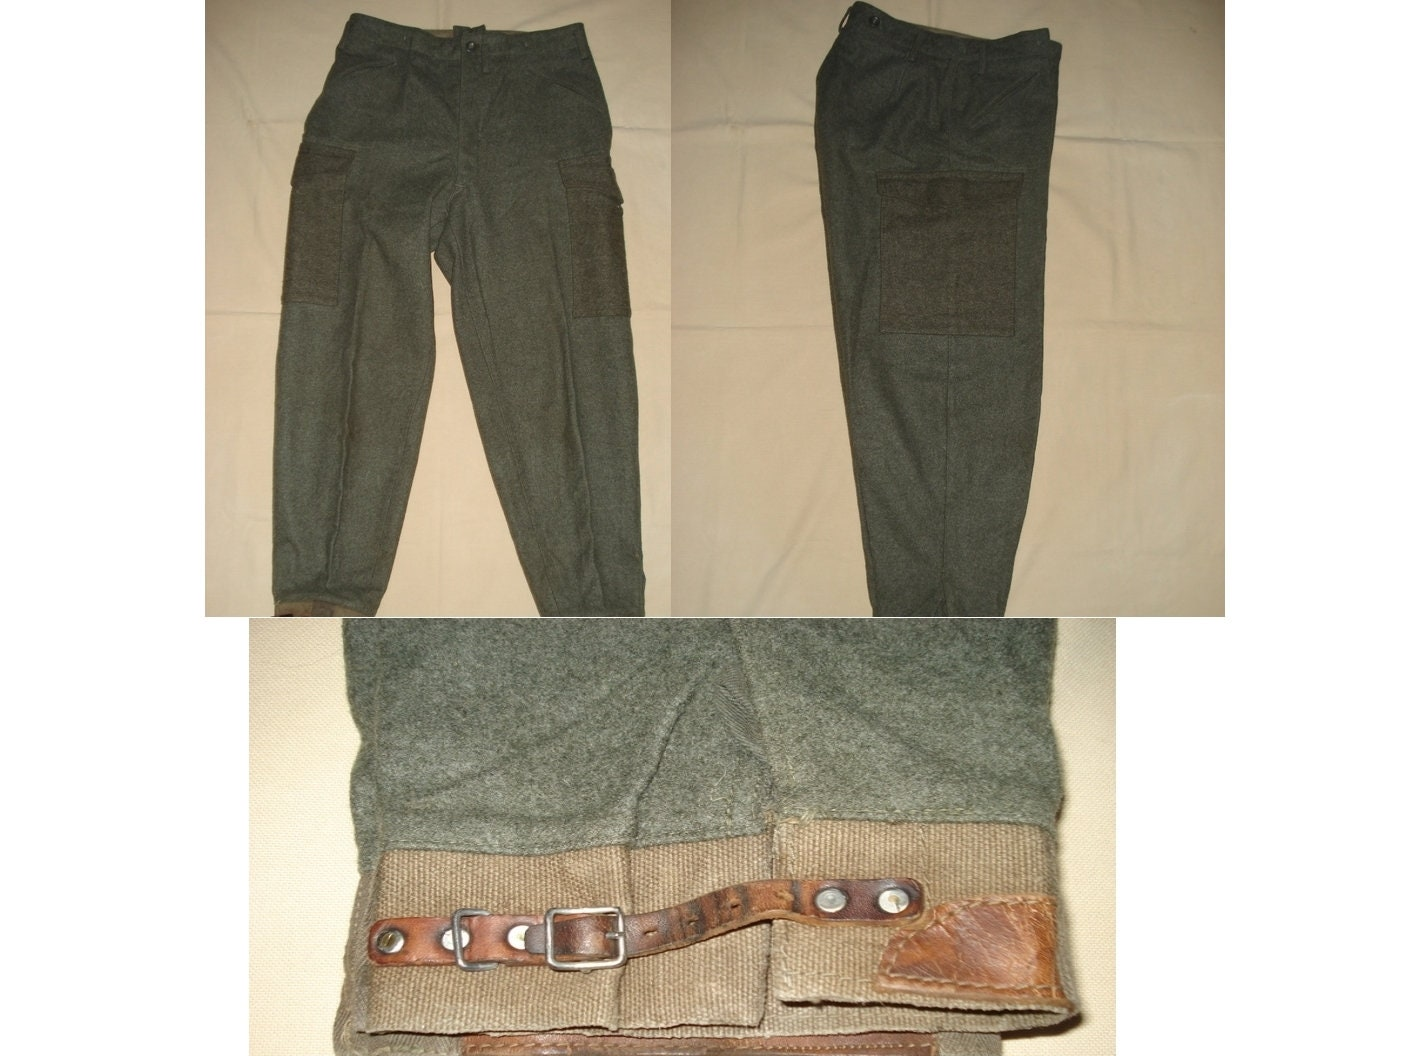 1940s Mens Ties | Wide Ties & Painted Ties Vintage Mens Swedish Military Wool Pants, Rare Authentic Vintage Wwii Army Trousers ?38, Clothing, 1940S Wool Pants $31.00 AT vintagedancer.com